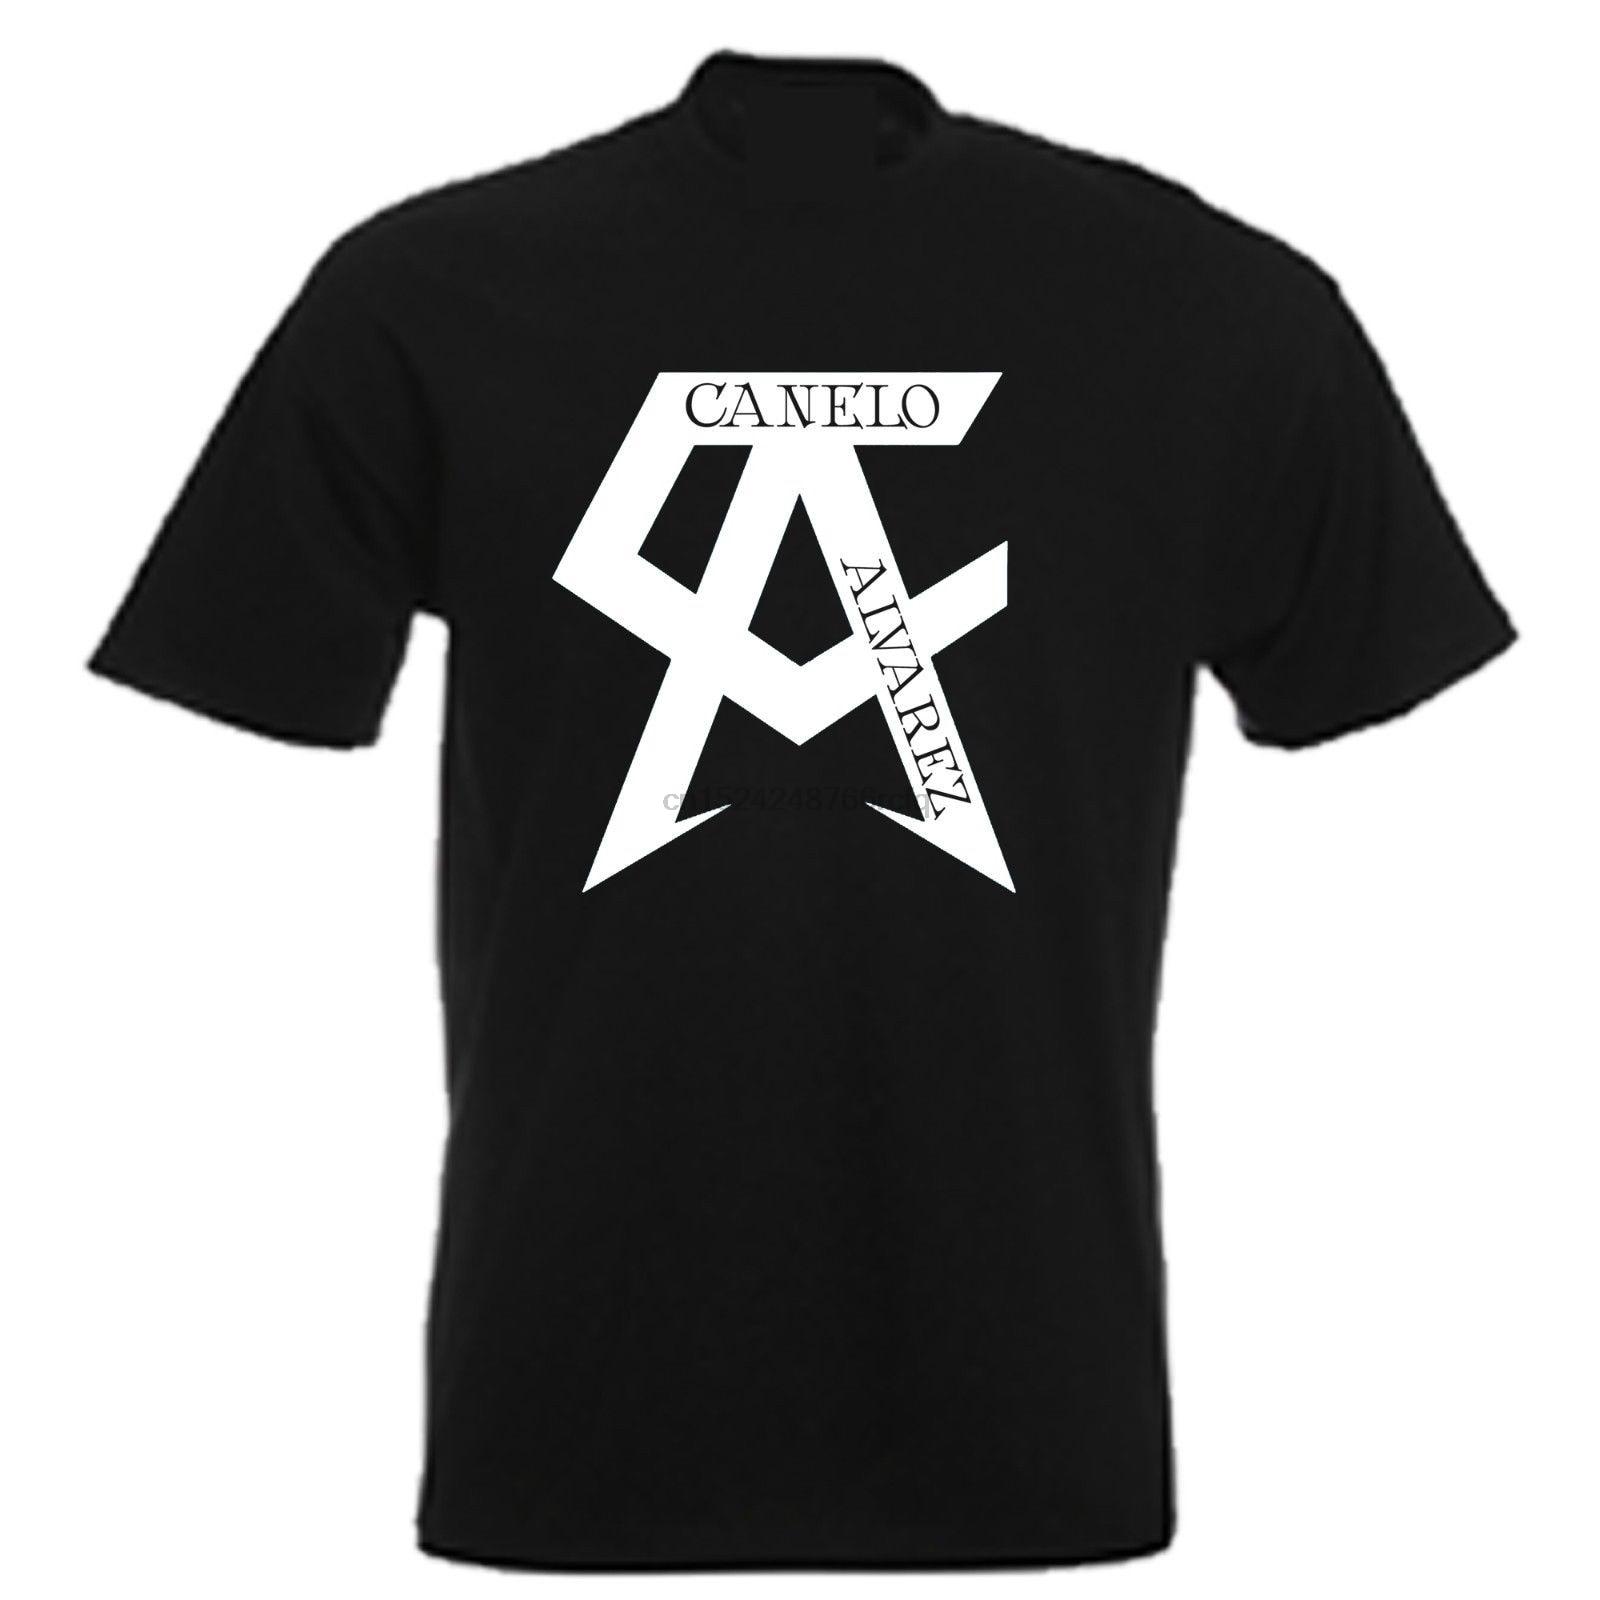 2018 verano camiseta CANELO ALVAREZ ICONIC BOXING Camiseta cuello redondo Camiseta de talla grande